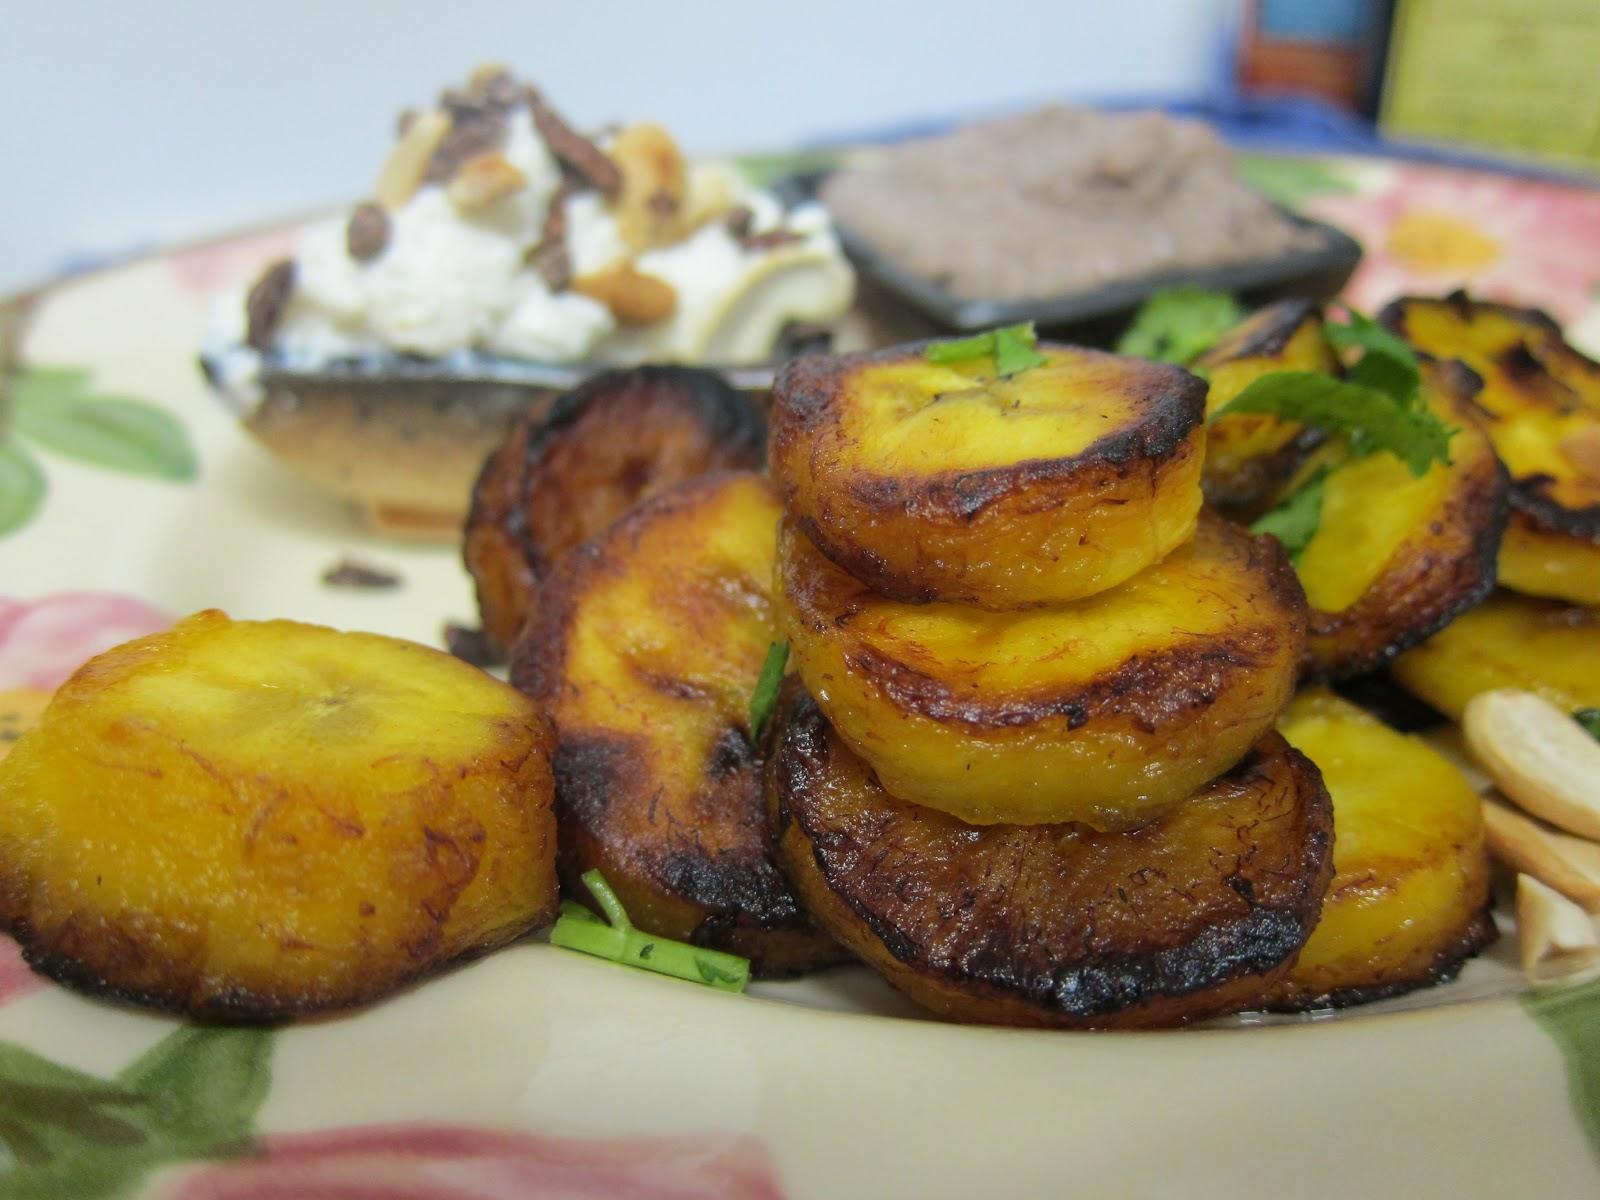 Banana Wonder Fried Plantains With Feta Sour Cream And Black Bean Hummus